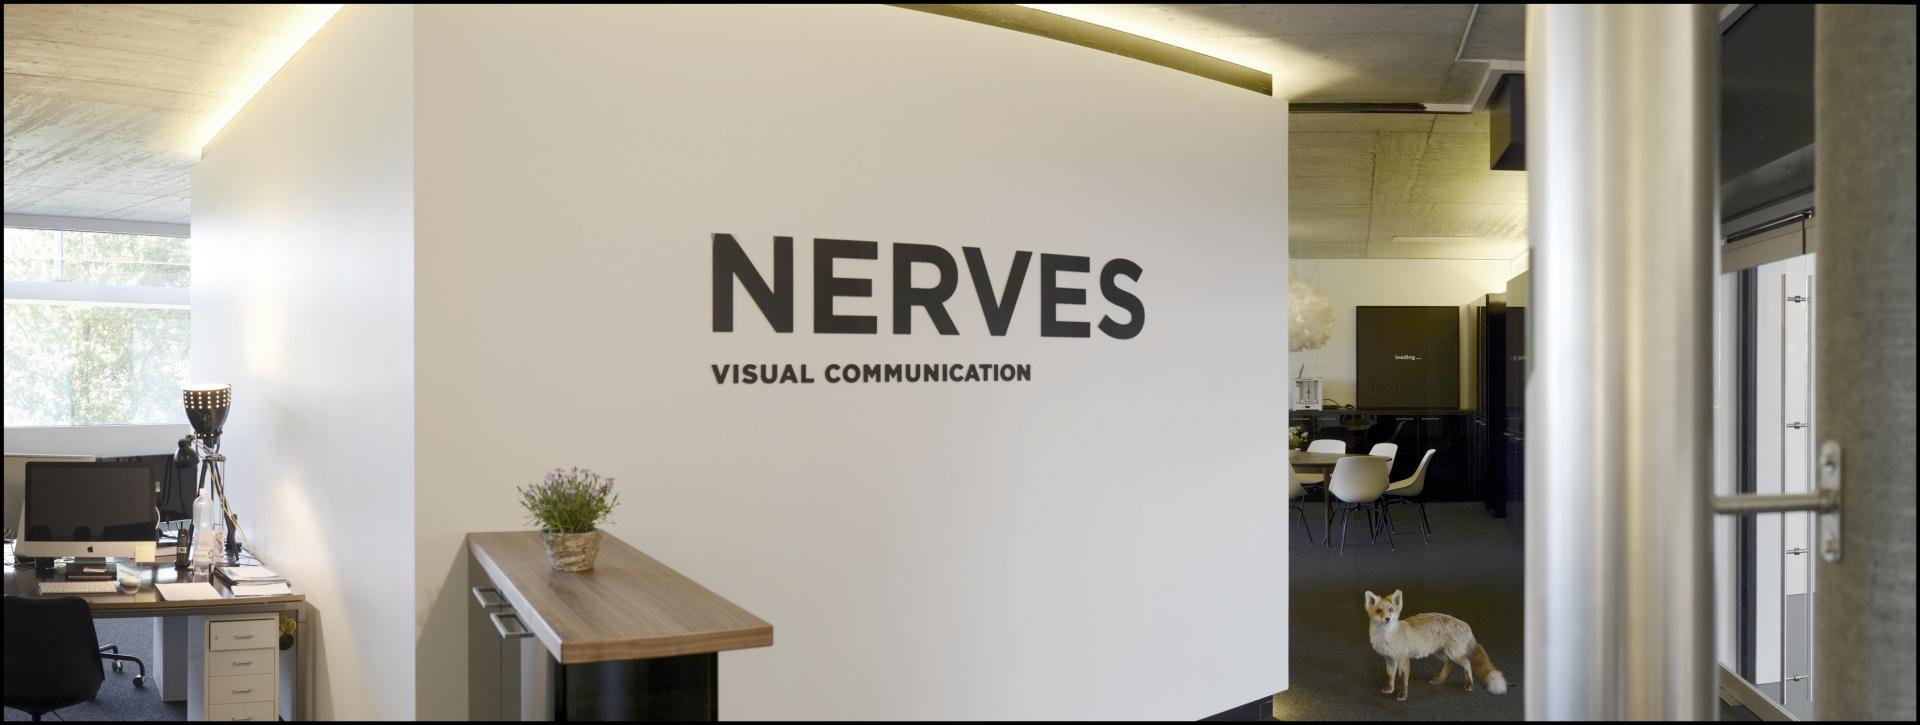 nerves pan eingangswand © mark hofstetter, glarus, archmark.ch, 055 640 29 44